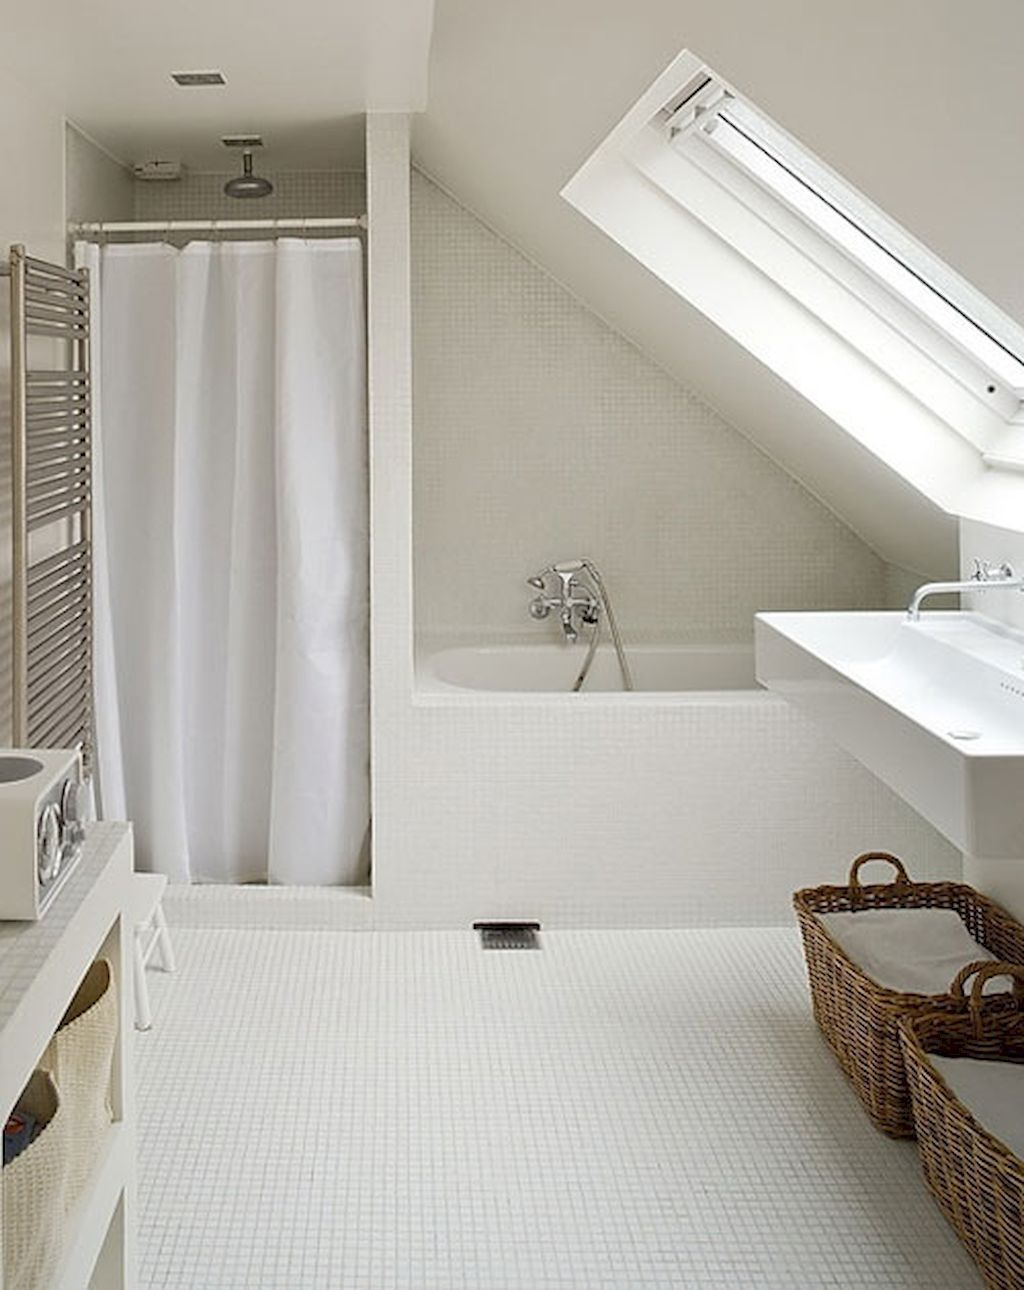 45 Cool Attic Bathroom Remodel Ideas | Attic bathroom, Attic and ...